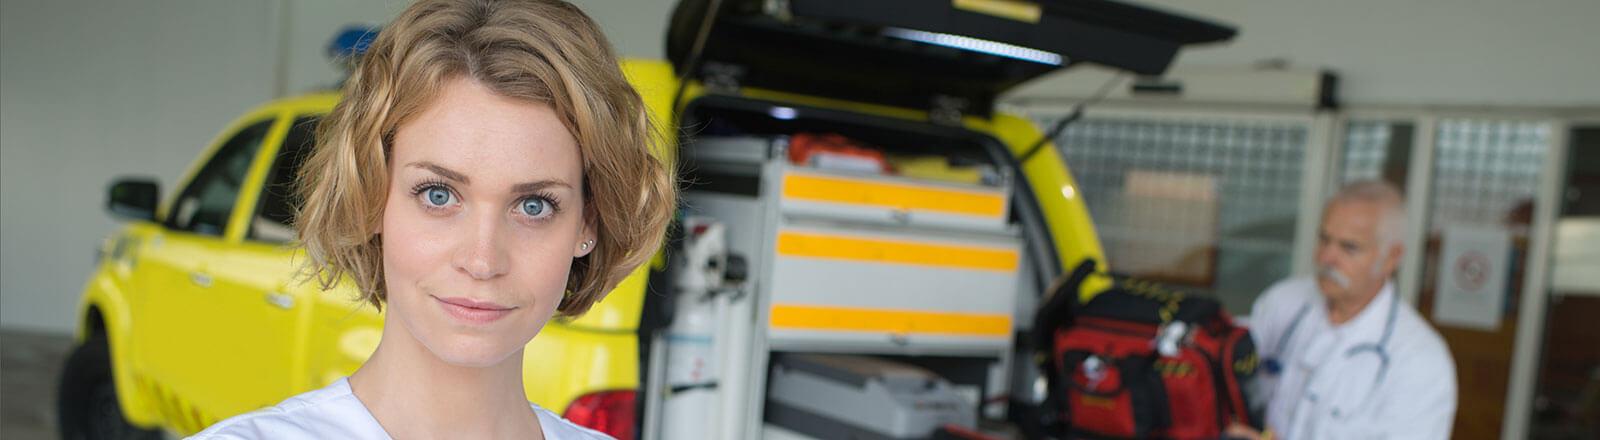 Notfall- und Medizinalbedarf